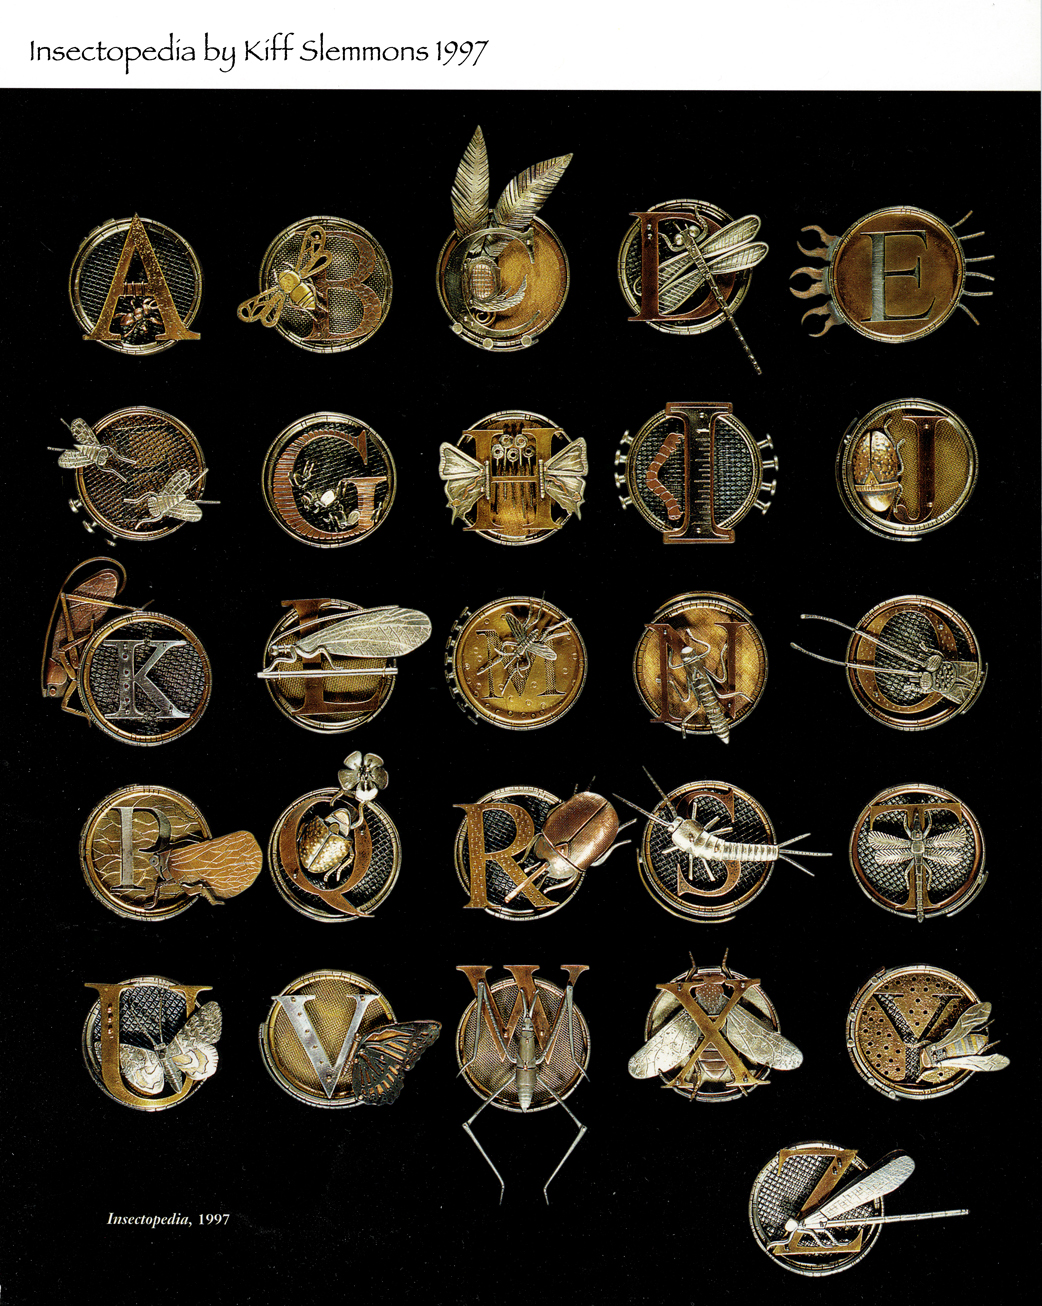 Insectopedia-Kiff Slemmons